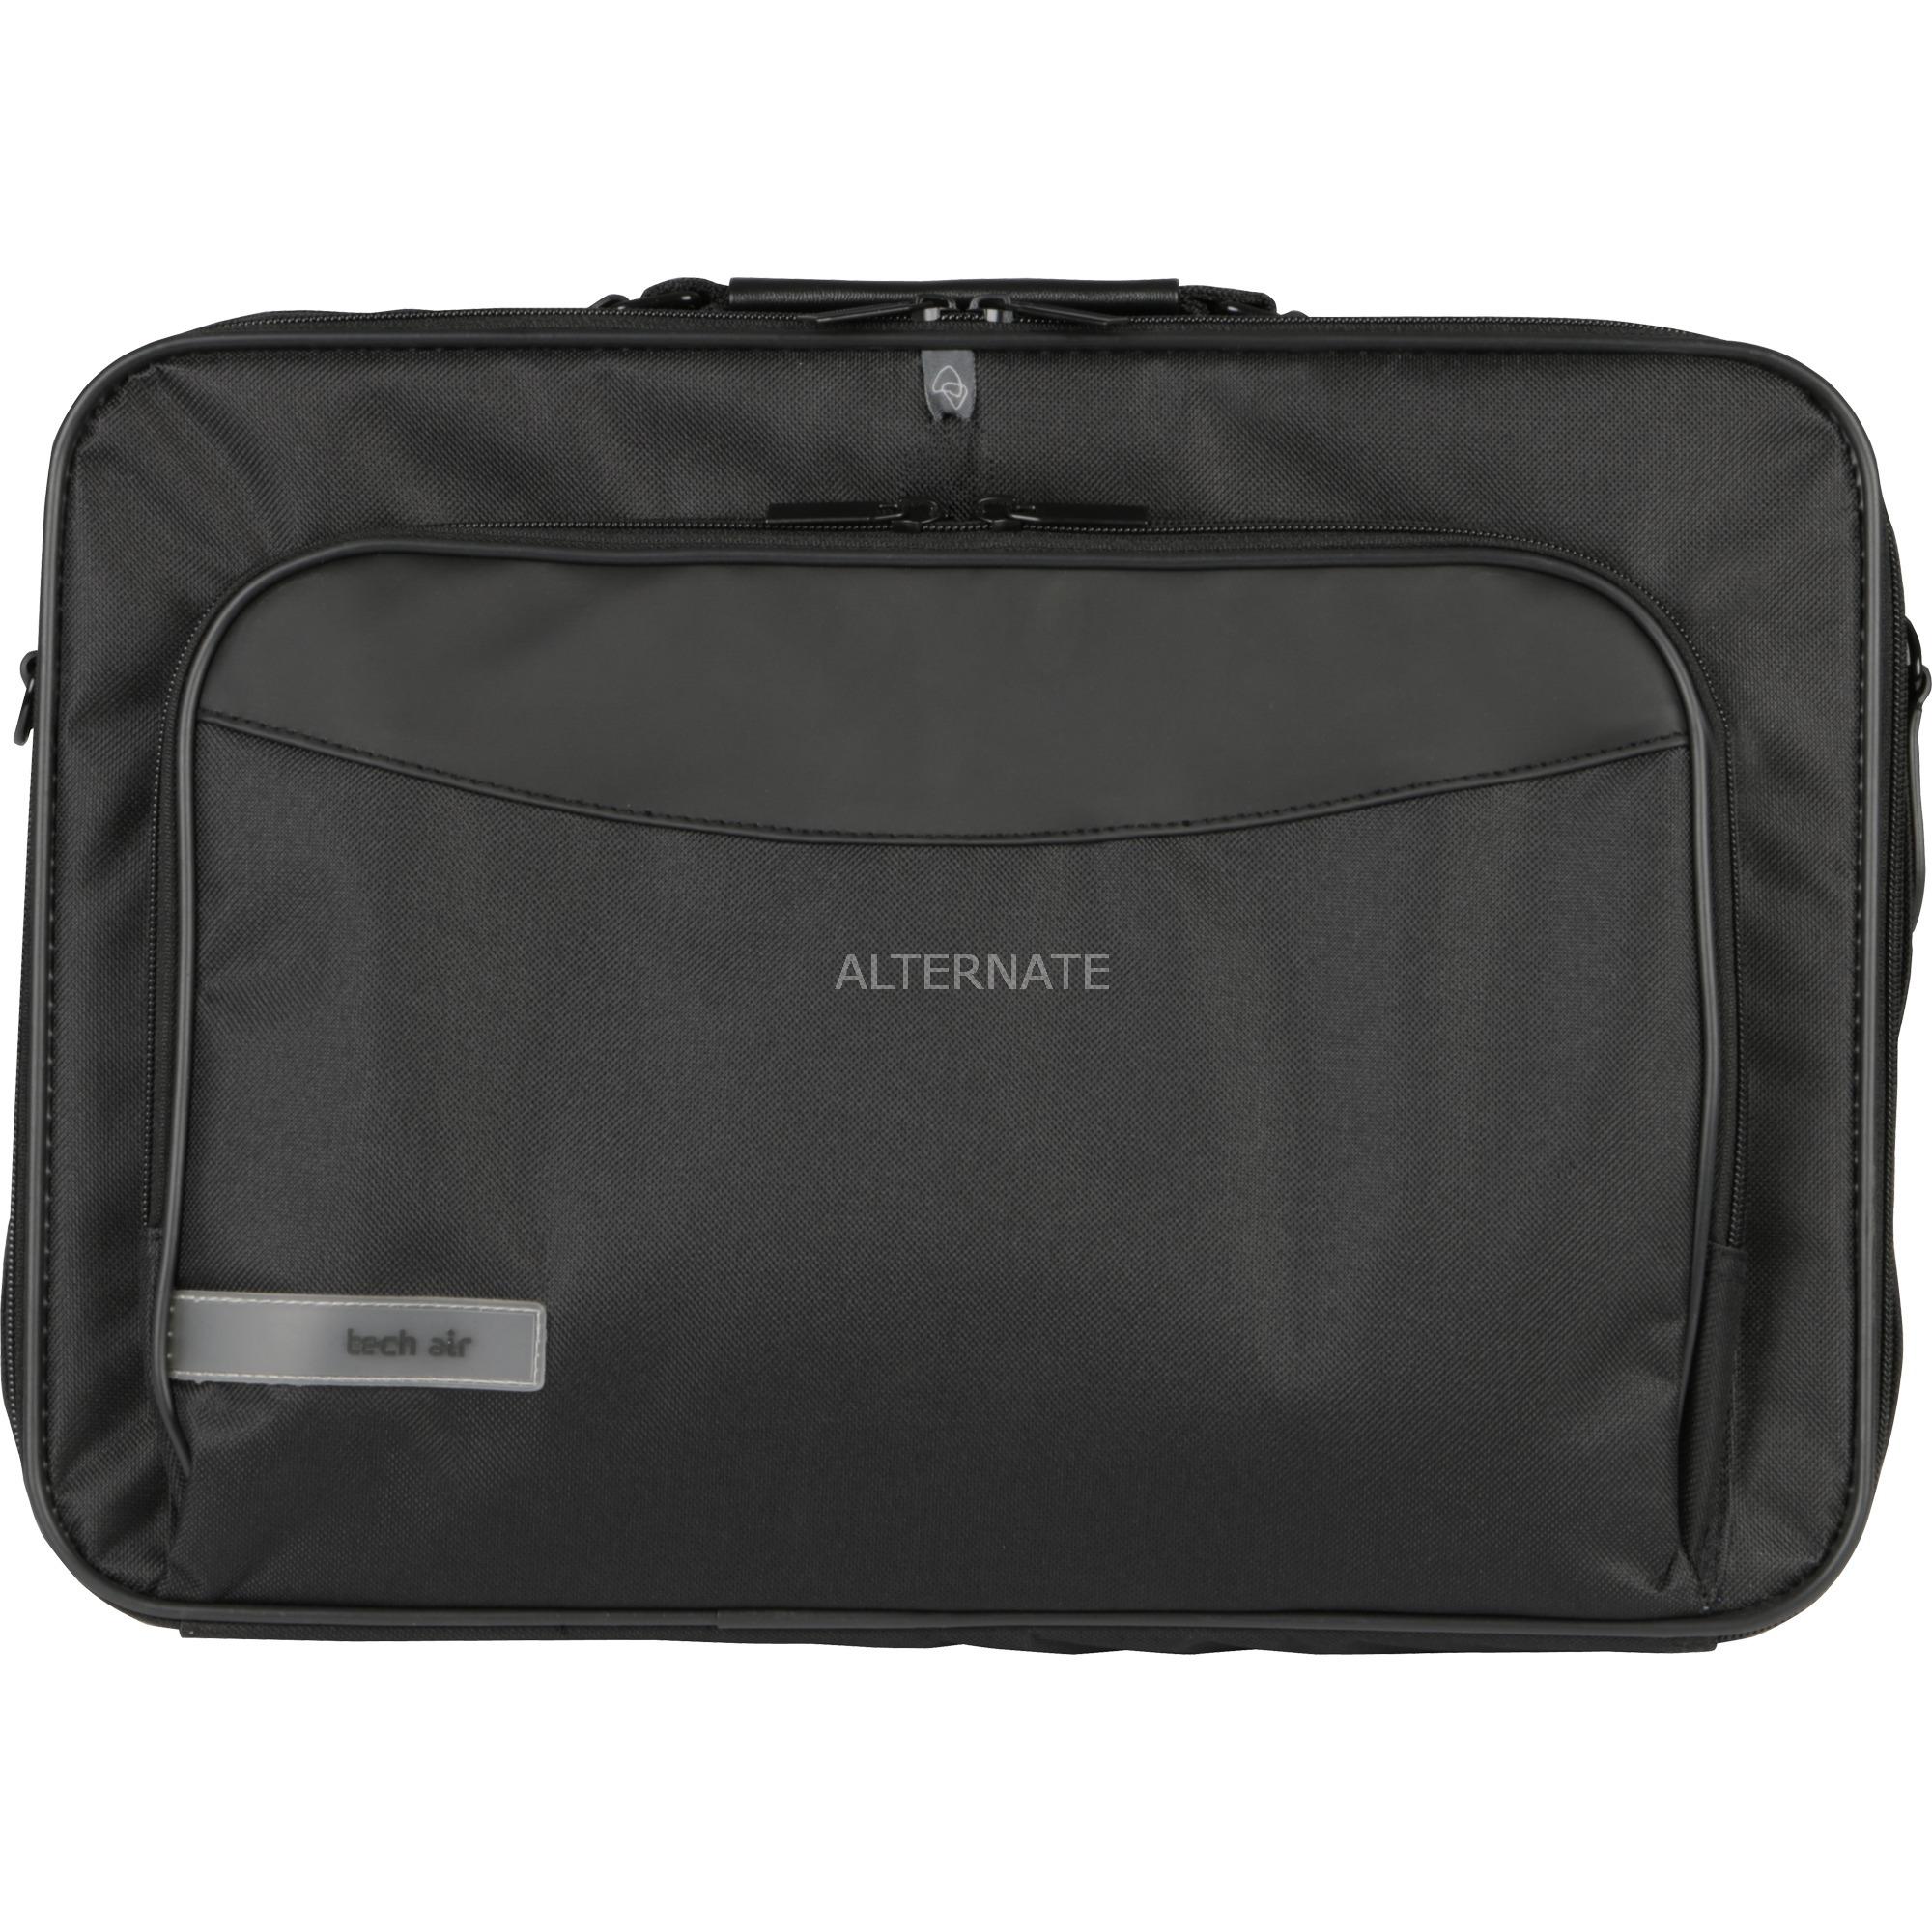 "ATCN20BRv5 39,6 cm (15.6"") Maletín Negro, Bolsa"